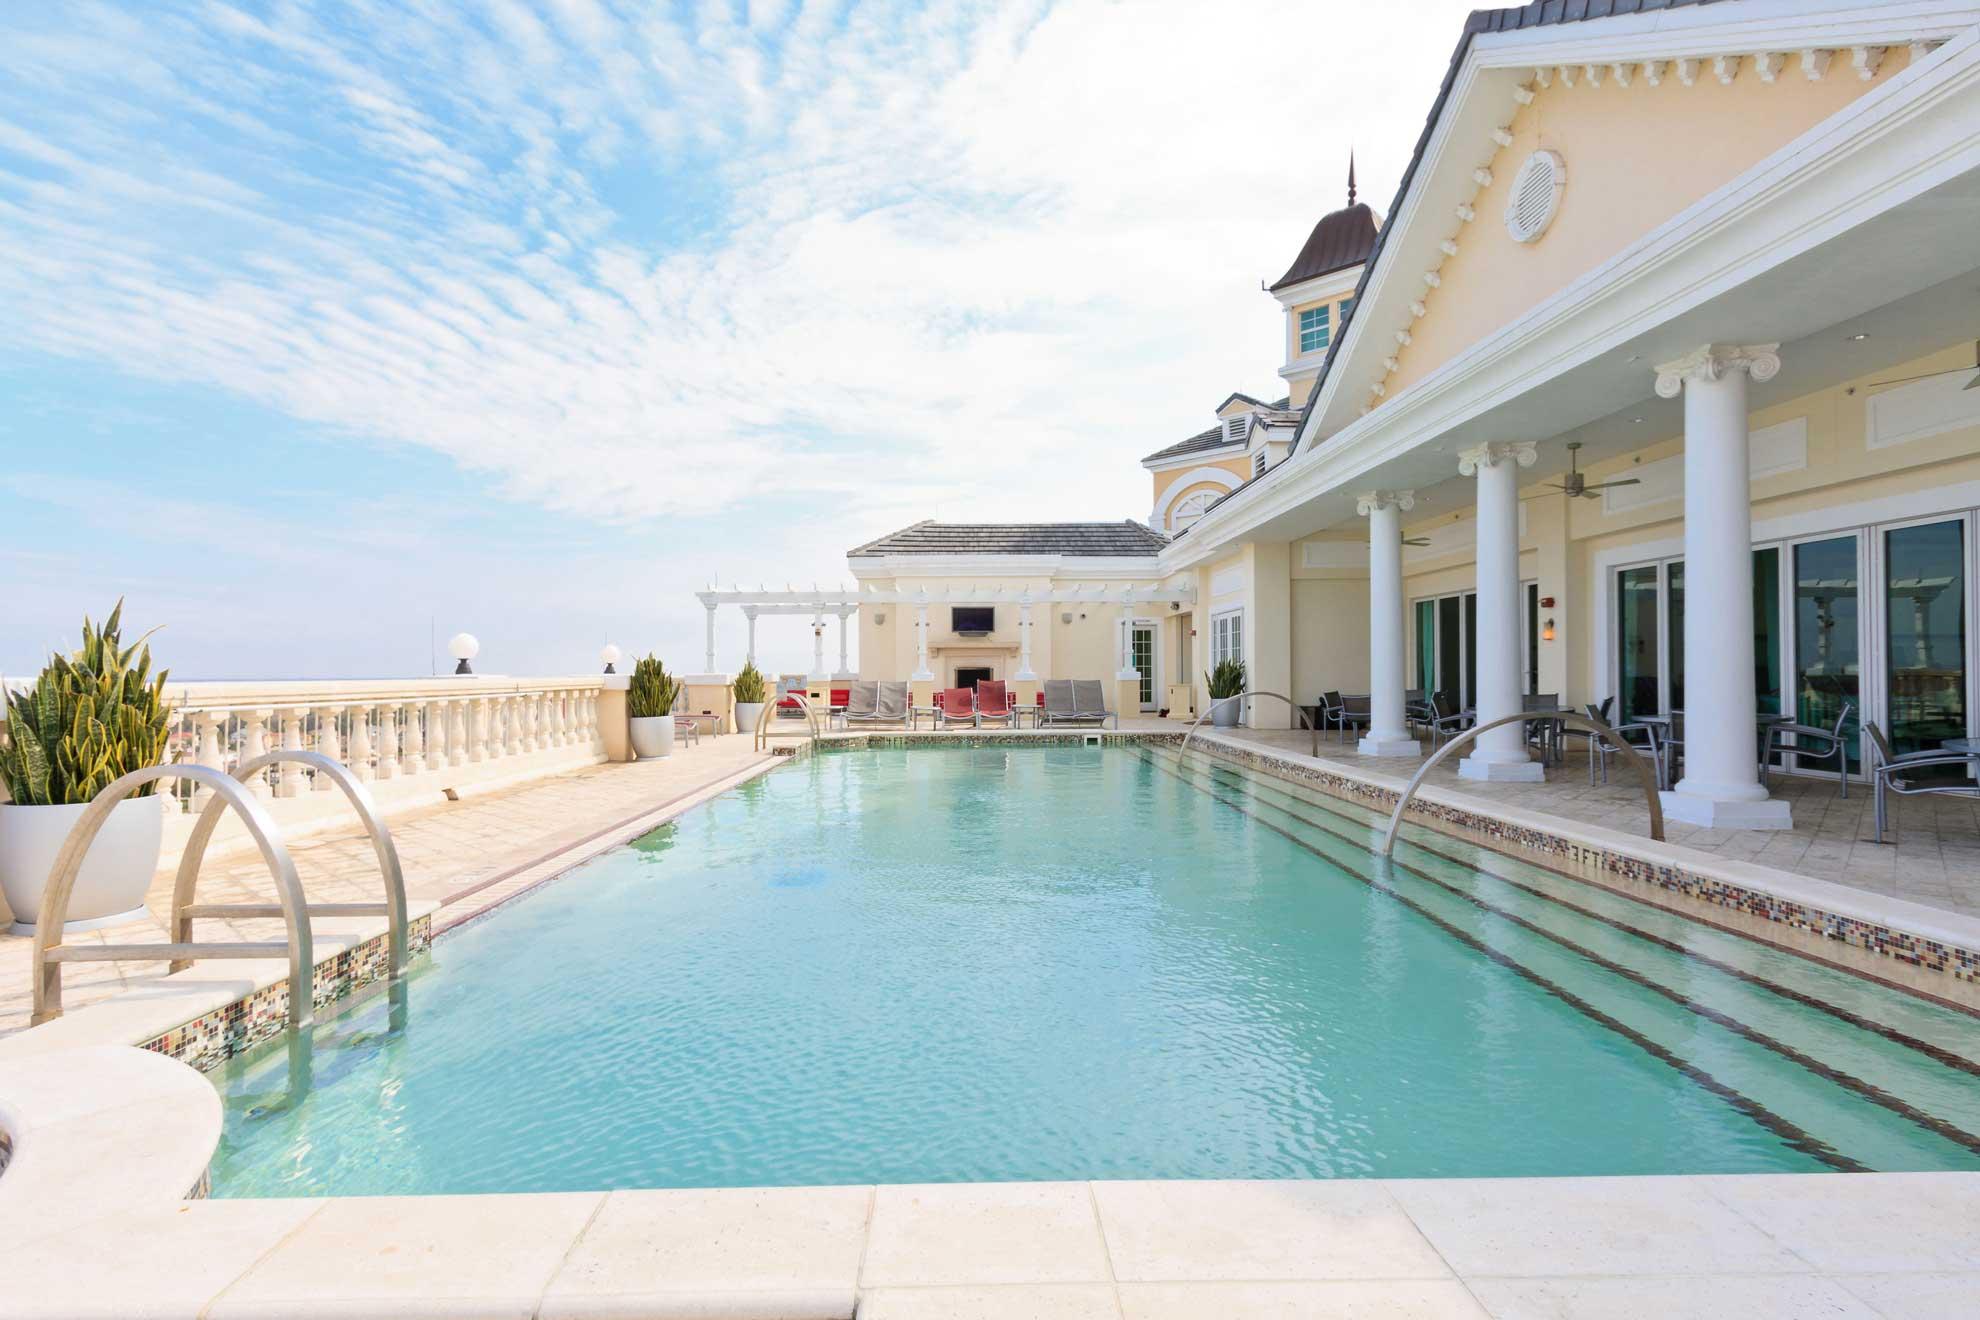 Eleven Pool at Reunion Resort